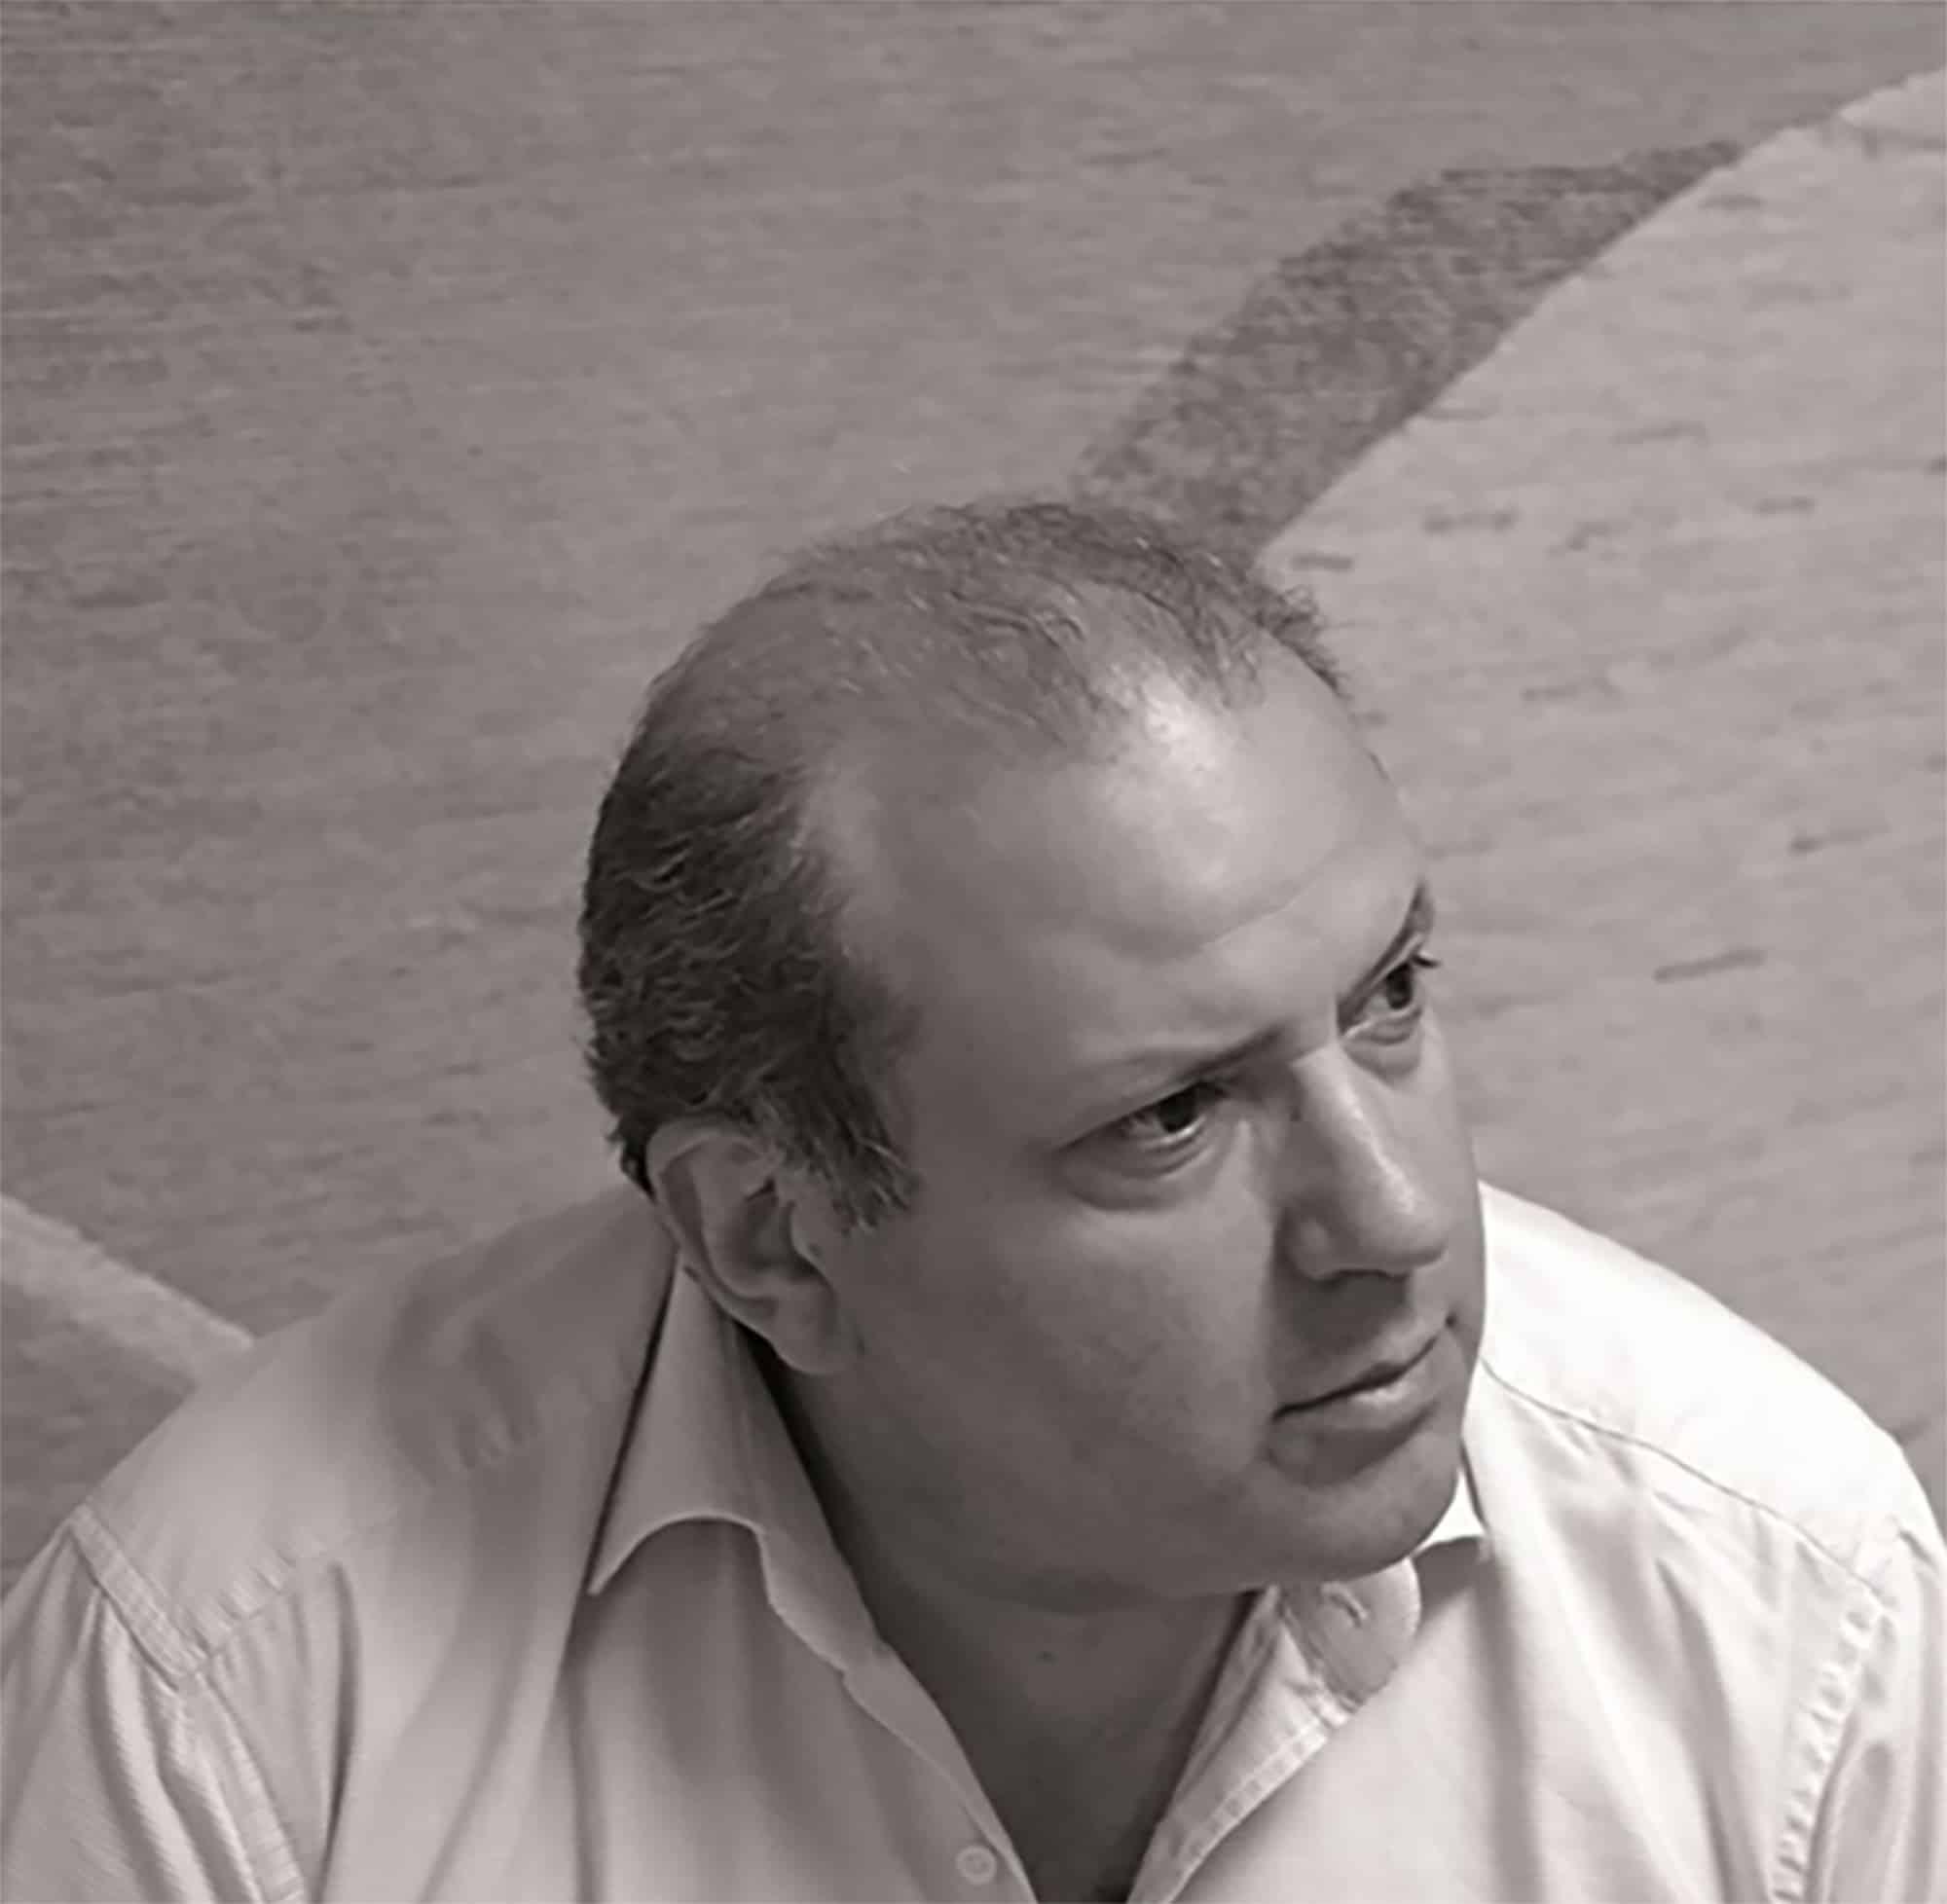 Marcel Zelmanovitch